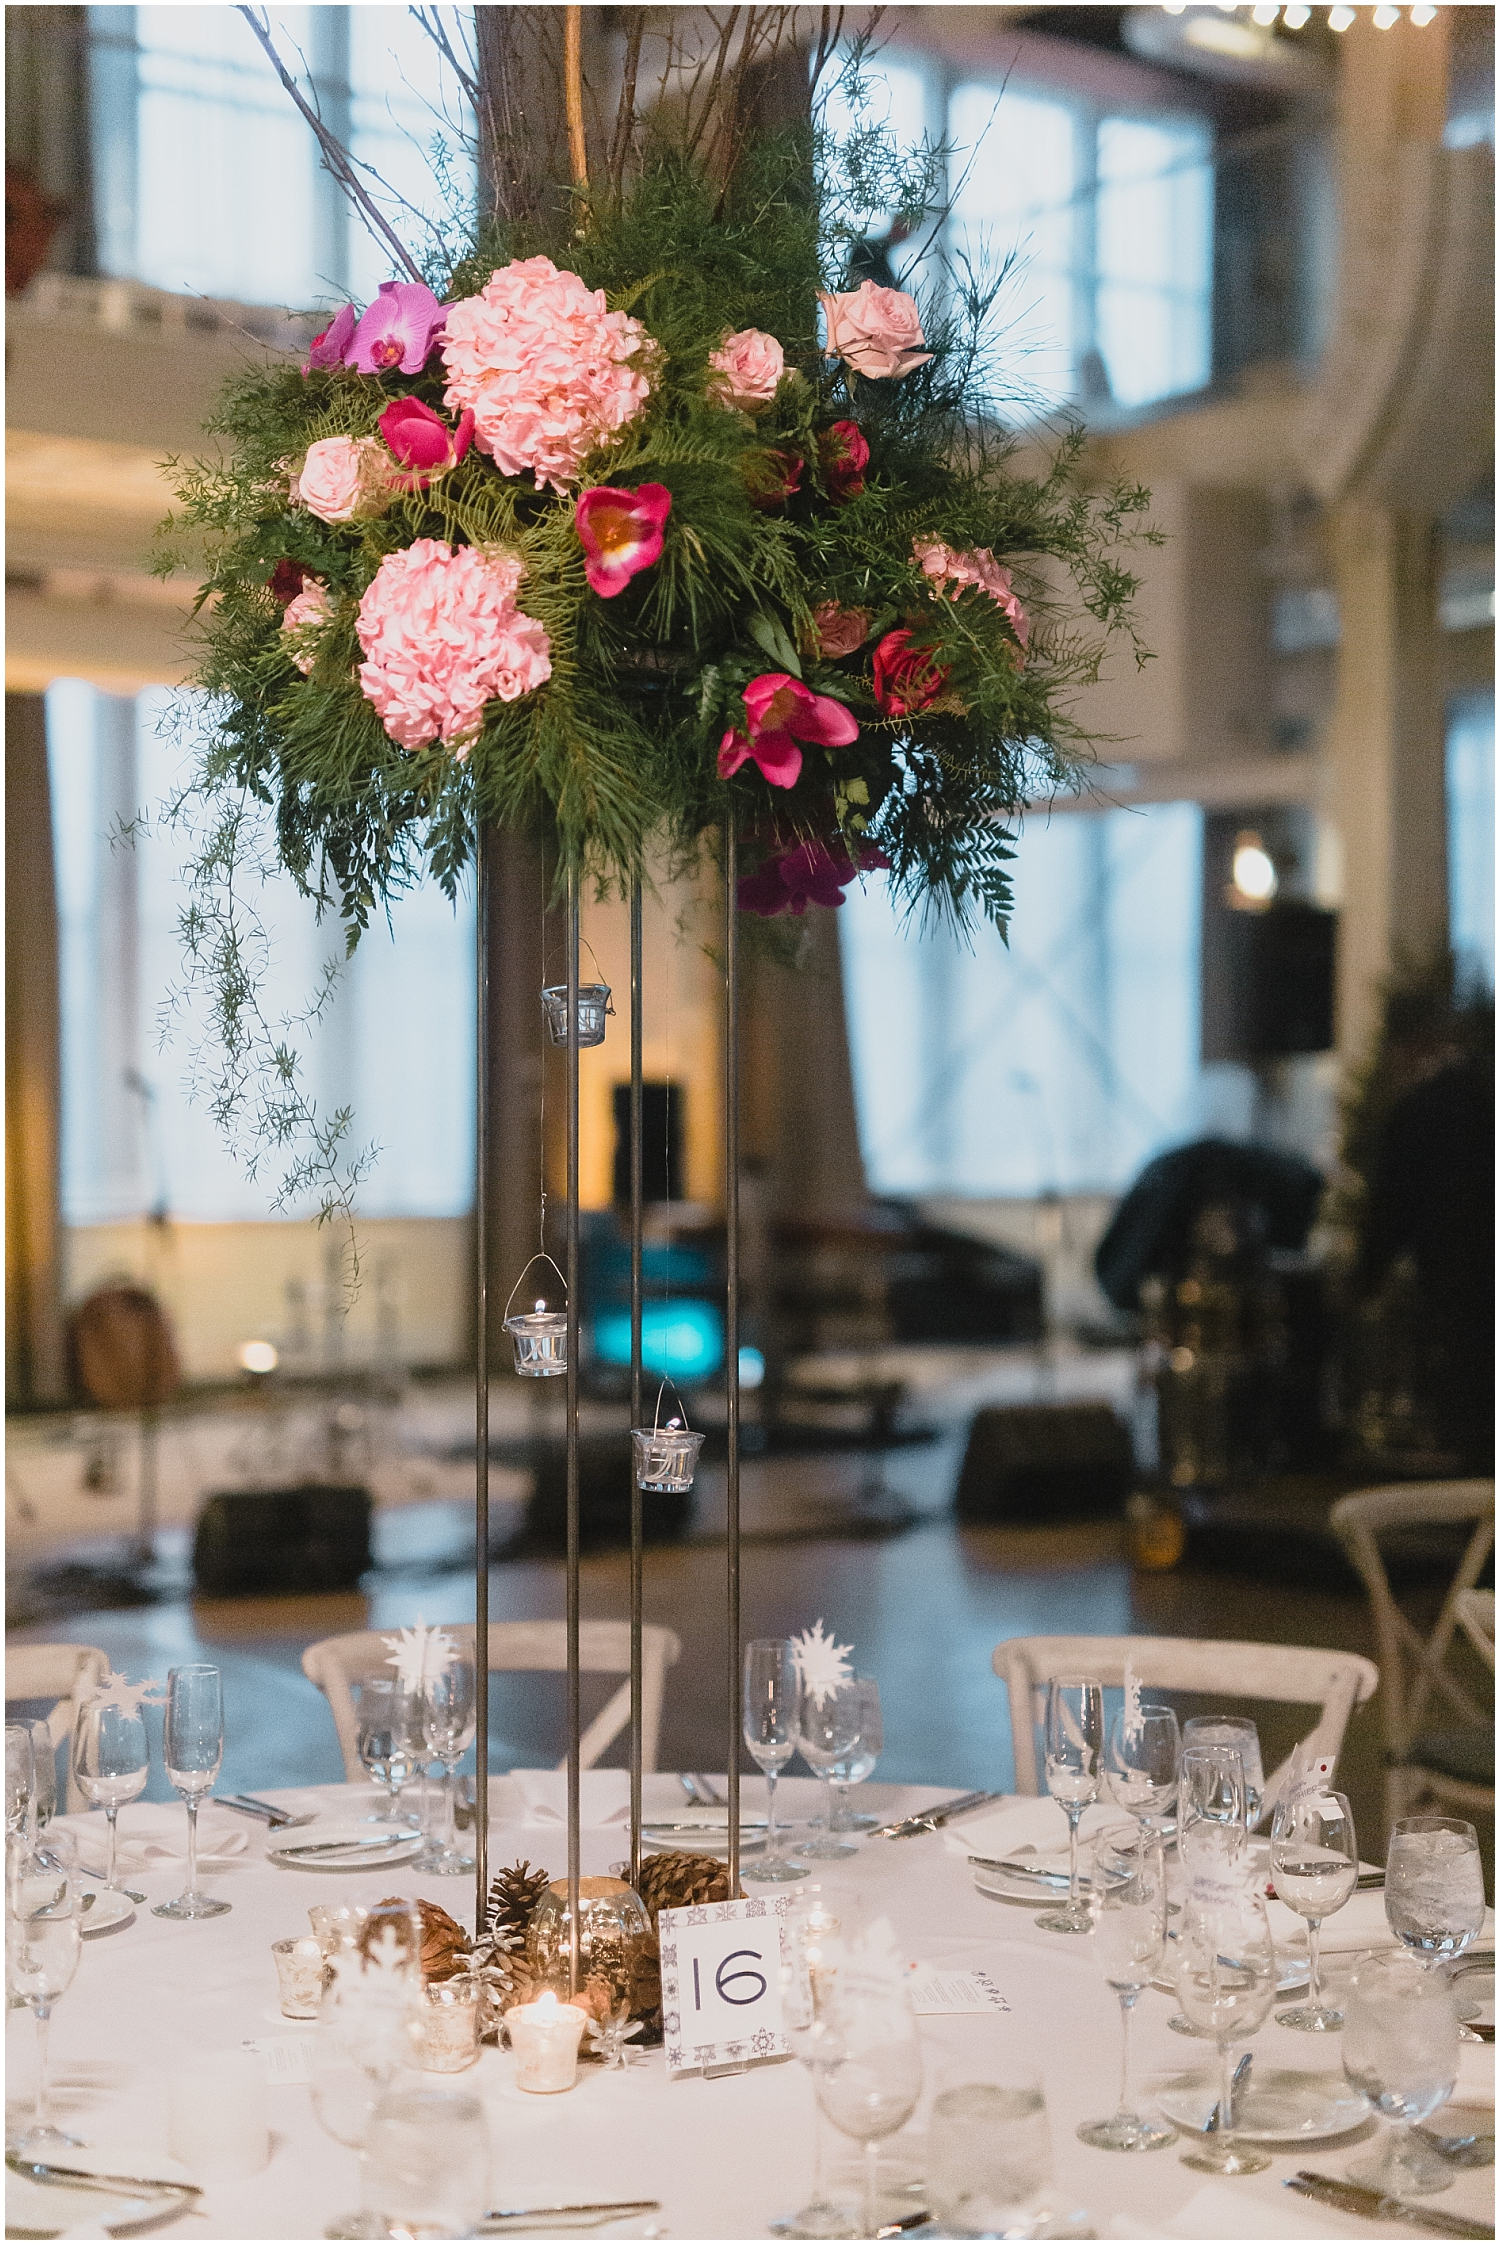 Minnesota Wedding Planner, Mpls Wedding Planner, Machine Shop MPLS, Mpls Wedding Venue,   Tall Floral Centerpieces